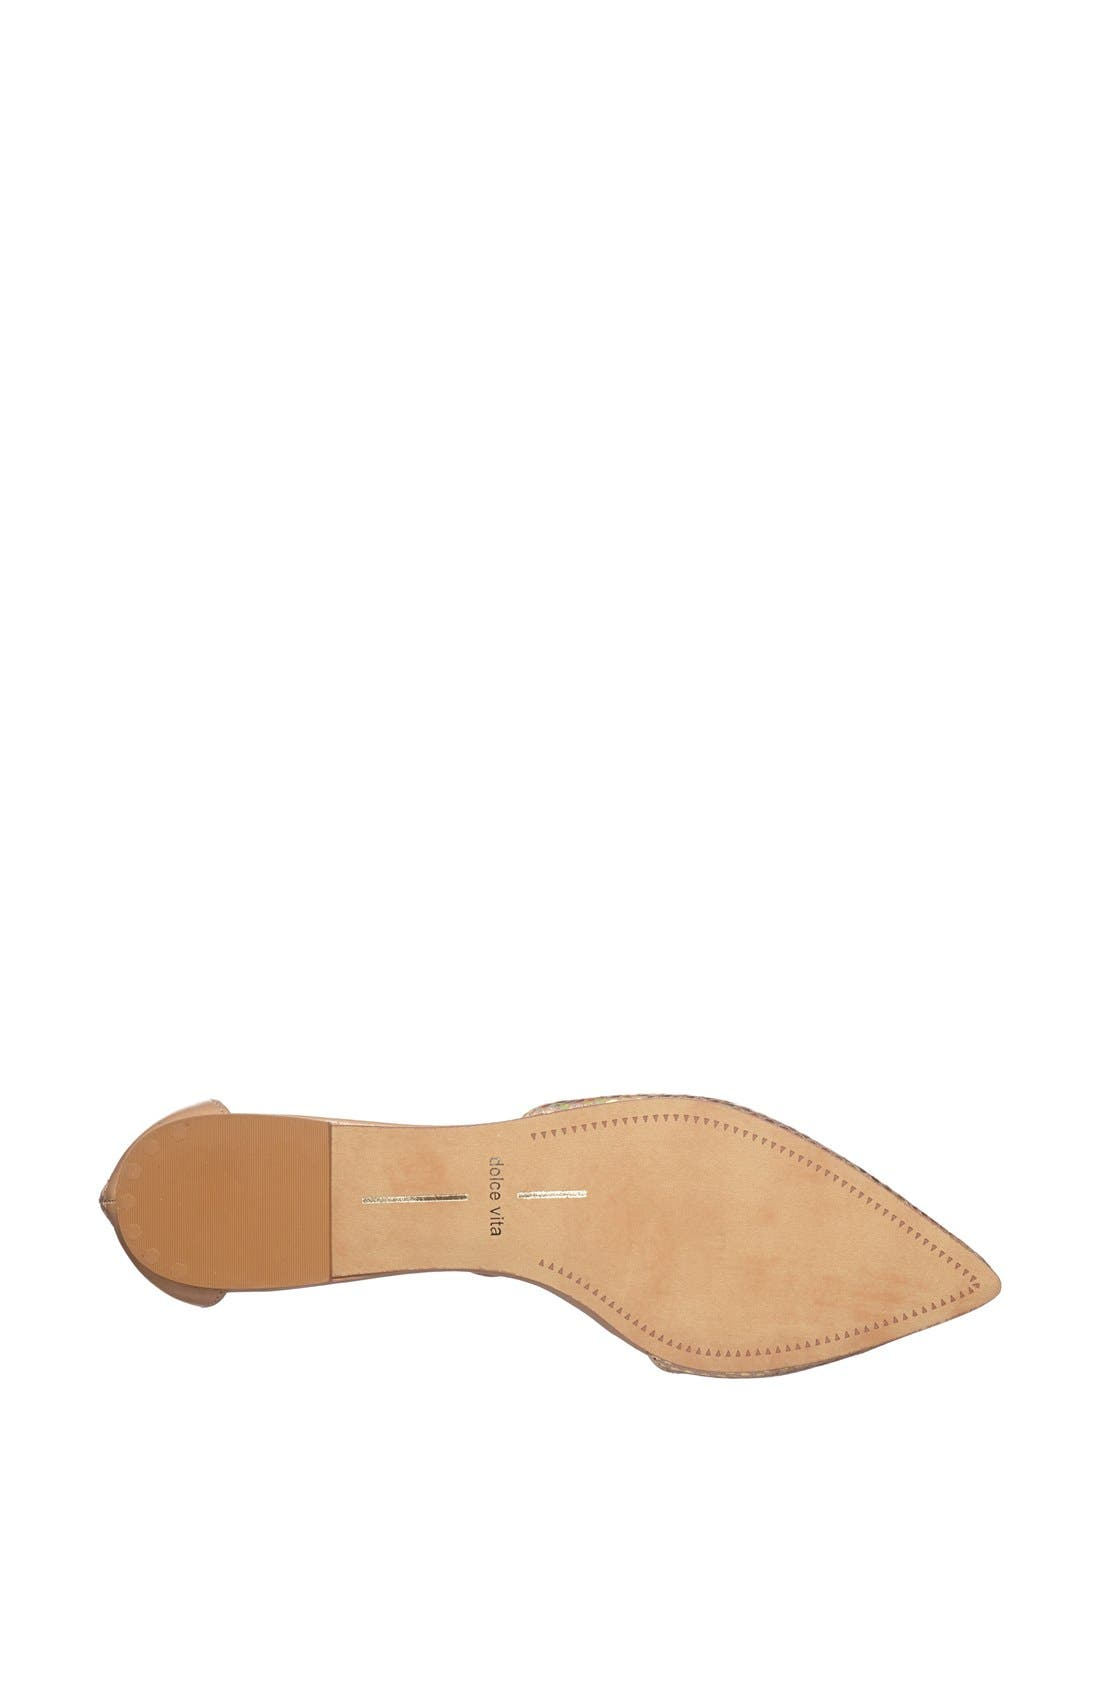 Alternate Image 4  - Dolce Vita 'Agusta' Ankle Strap d'Orsay Flat